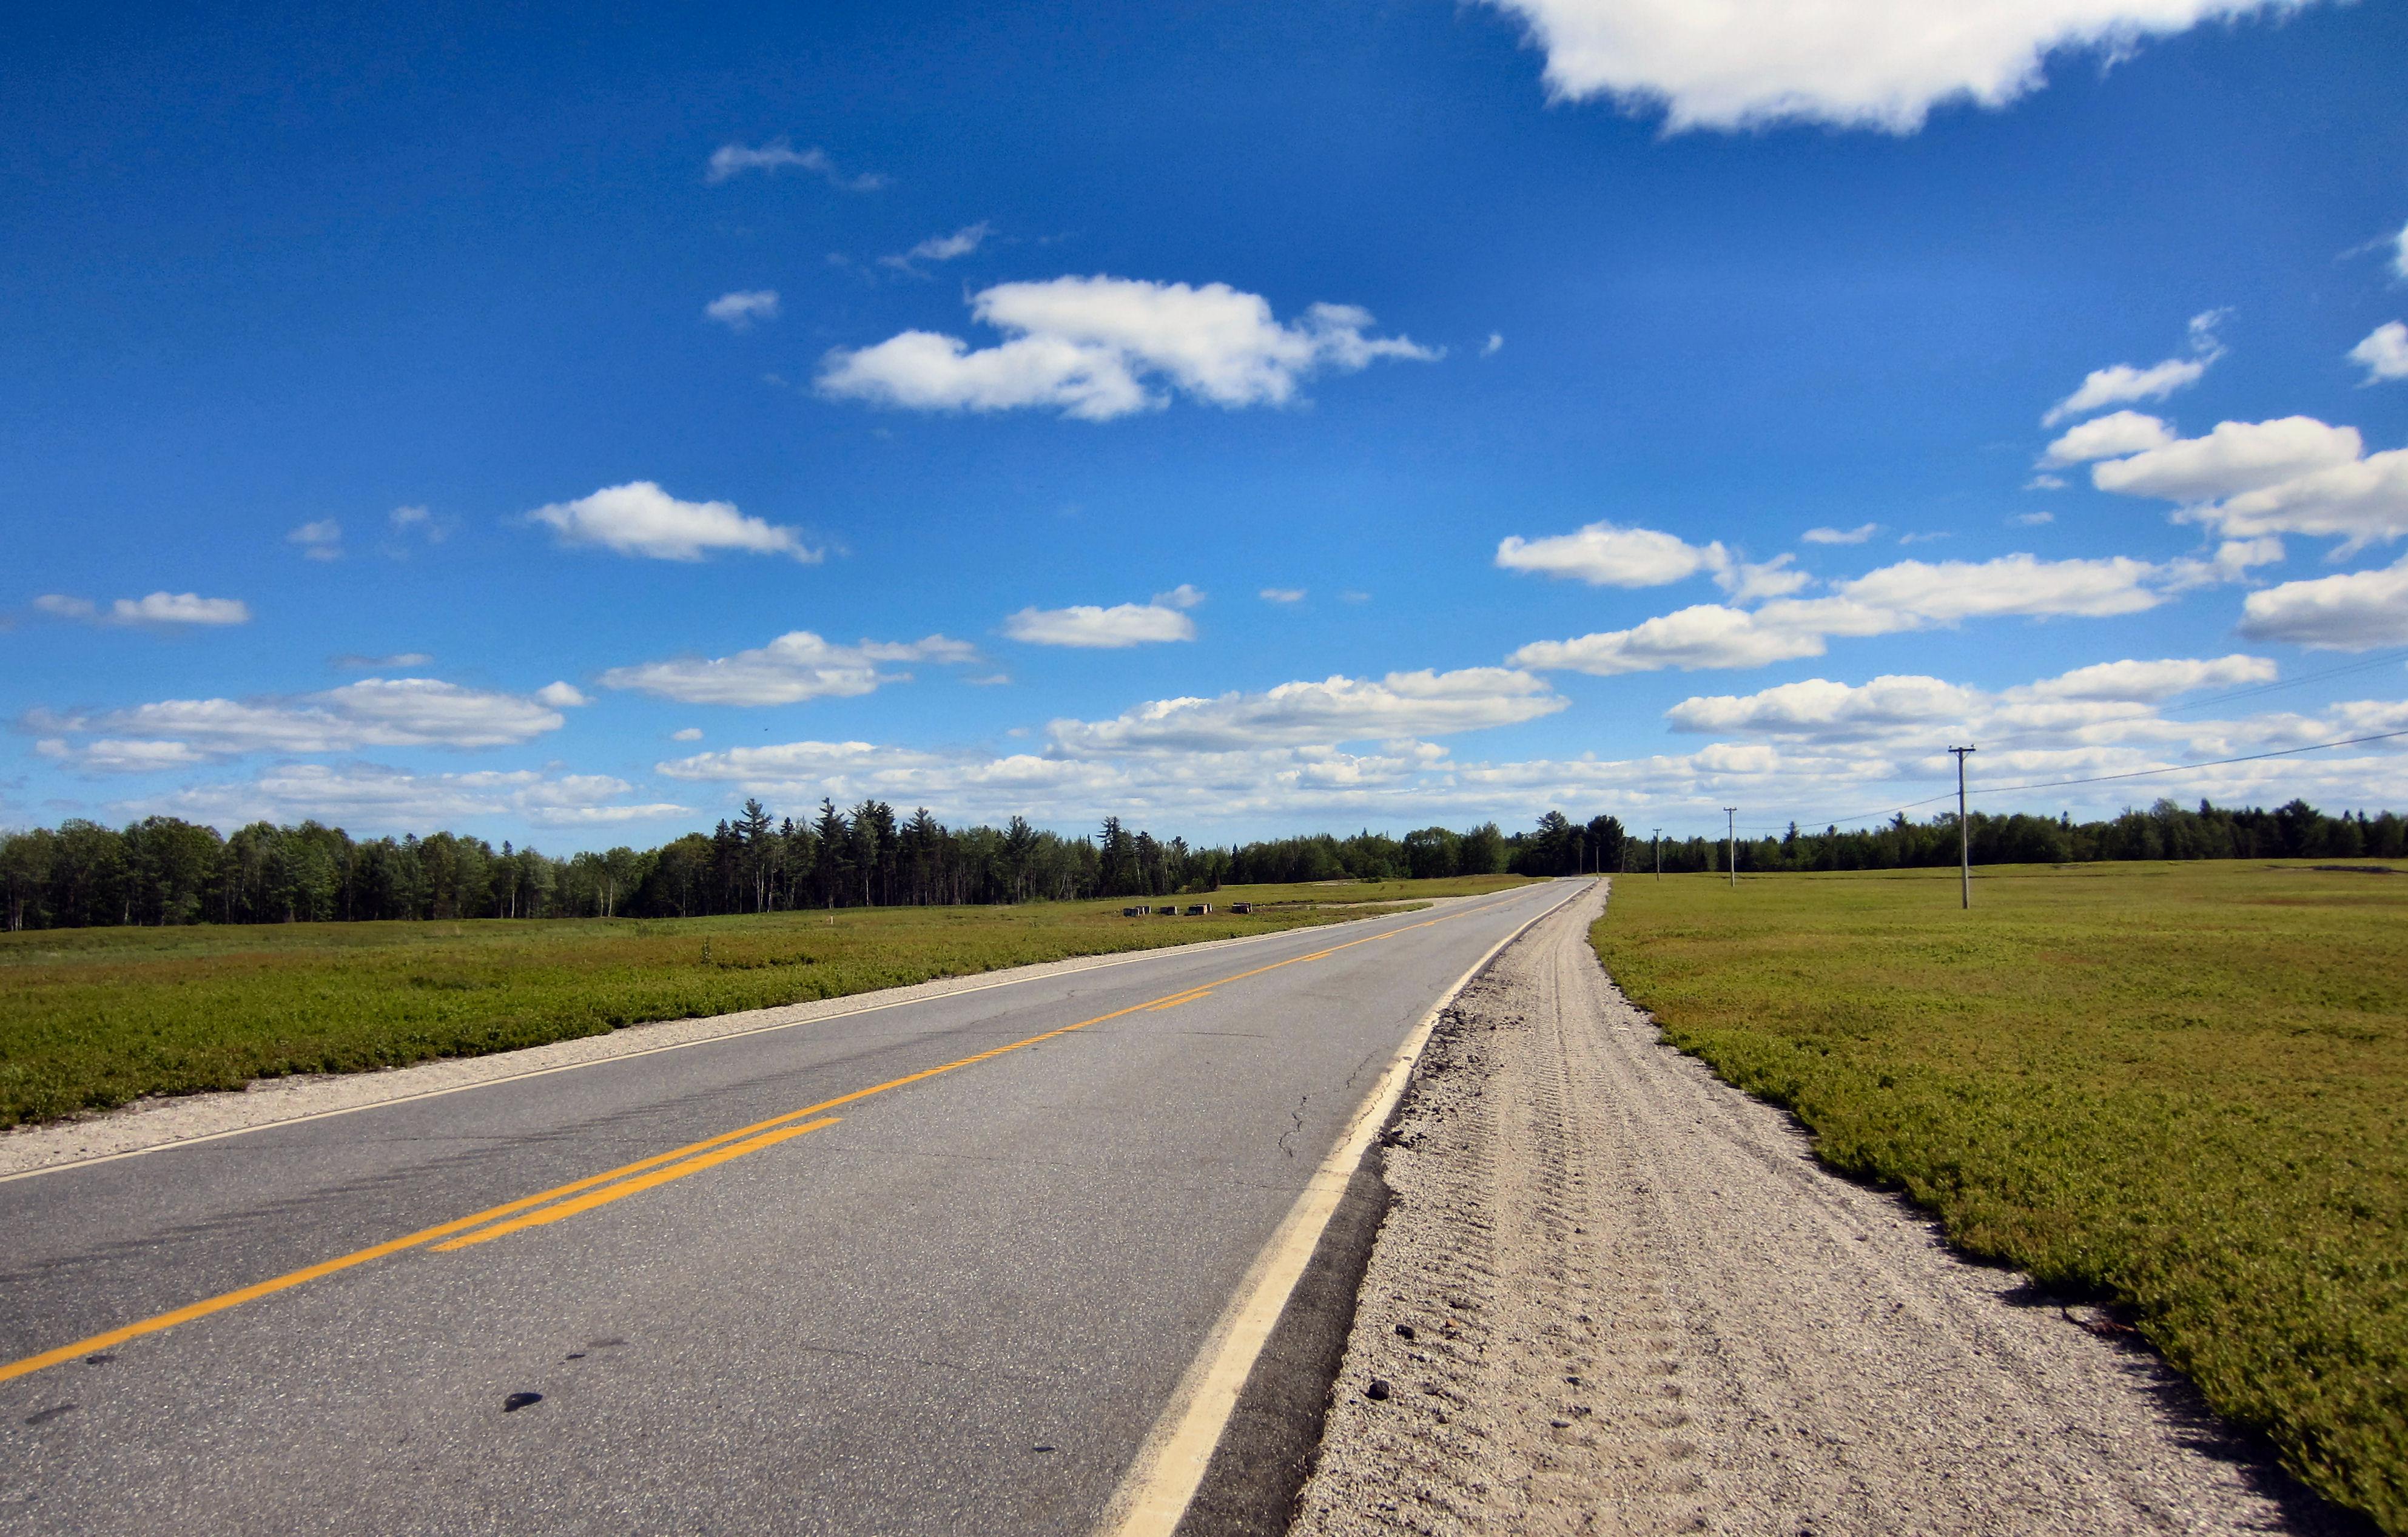 Ripley-trip-b-barrens-2, blueberrie fields in Maine, Maine Blueberries